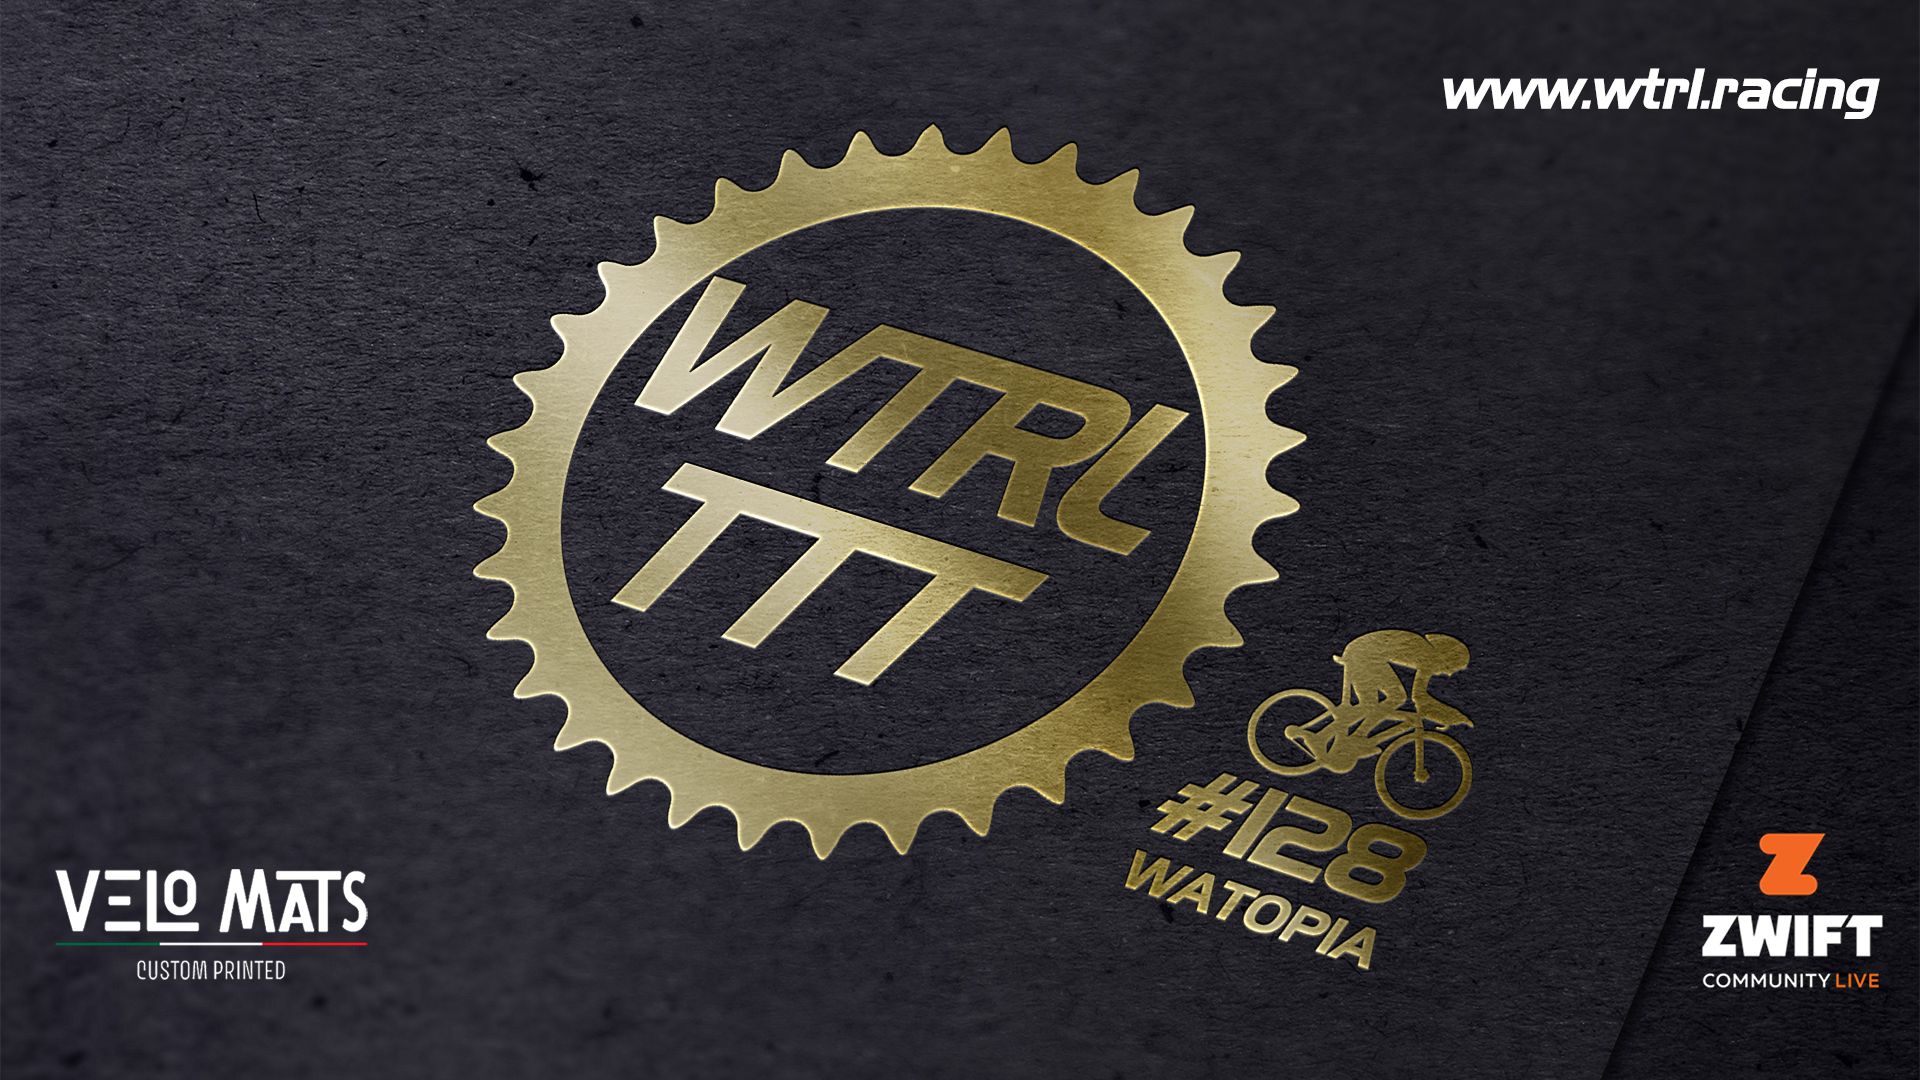 WTRL Team Time Trial